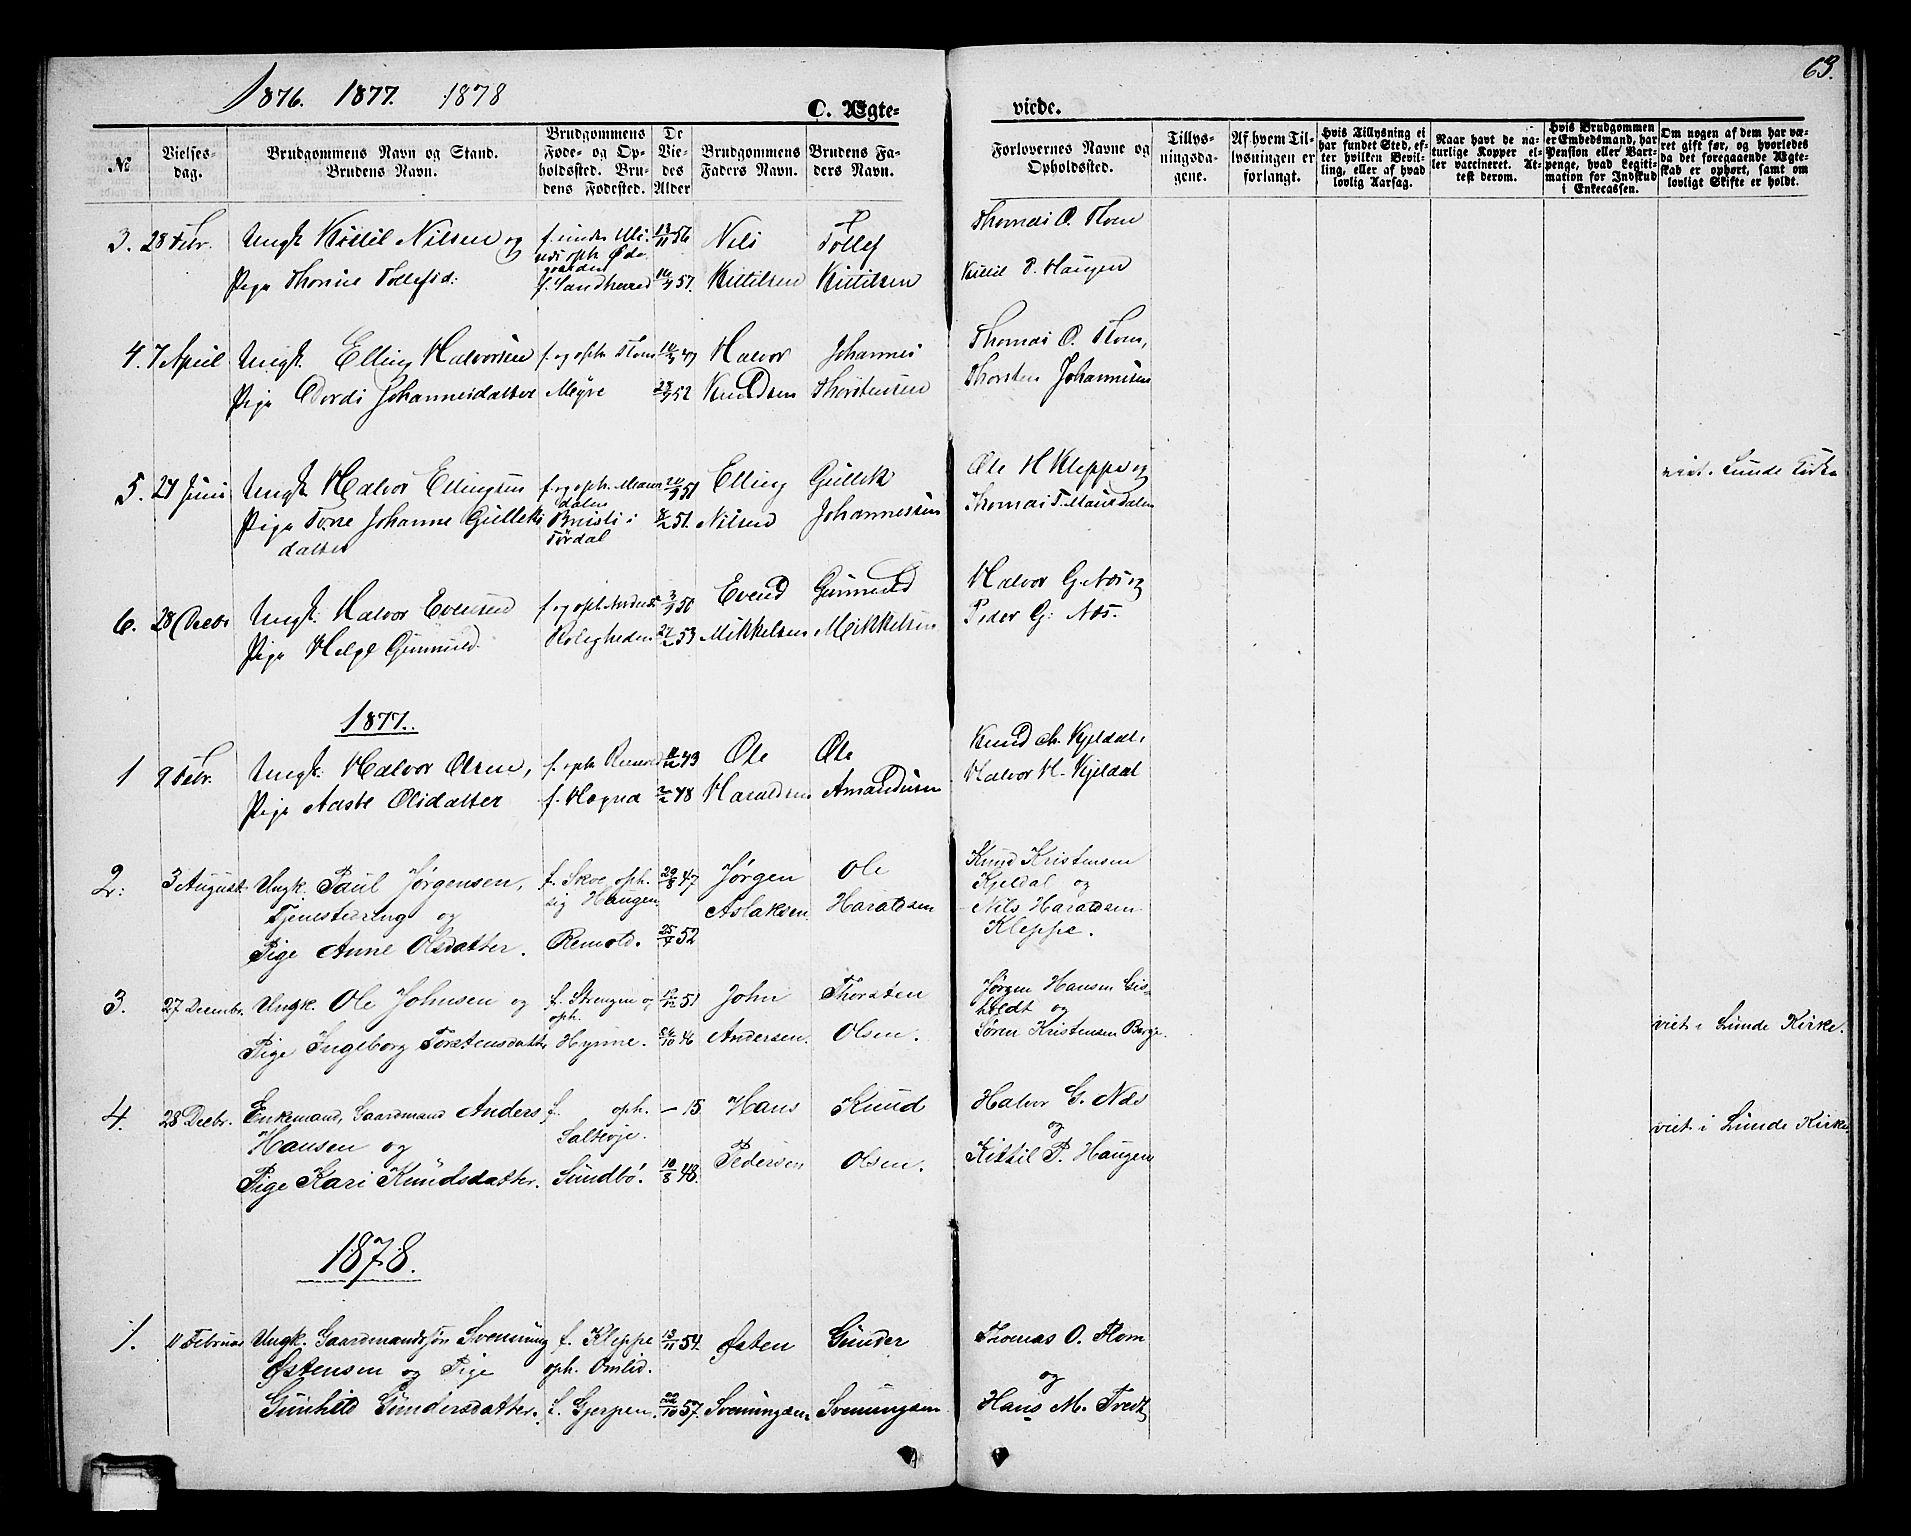 SAKO, Lunde kirkebøker, G/Gb/L0001: Klokkerbok nr. II 1, 1866-1887, s. 63